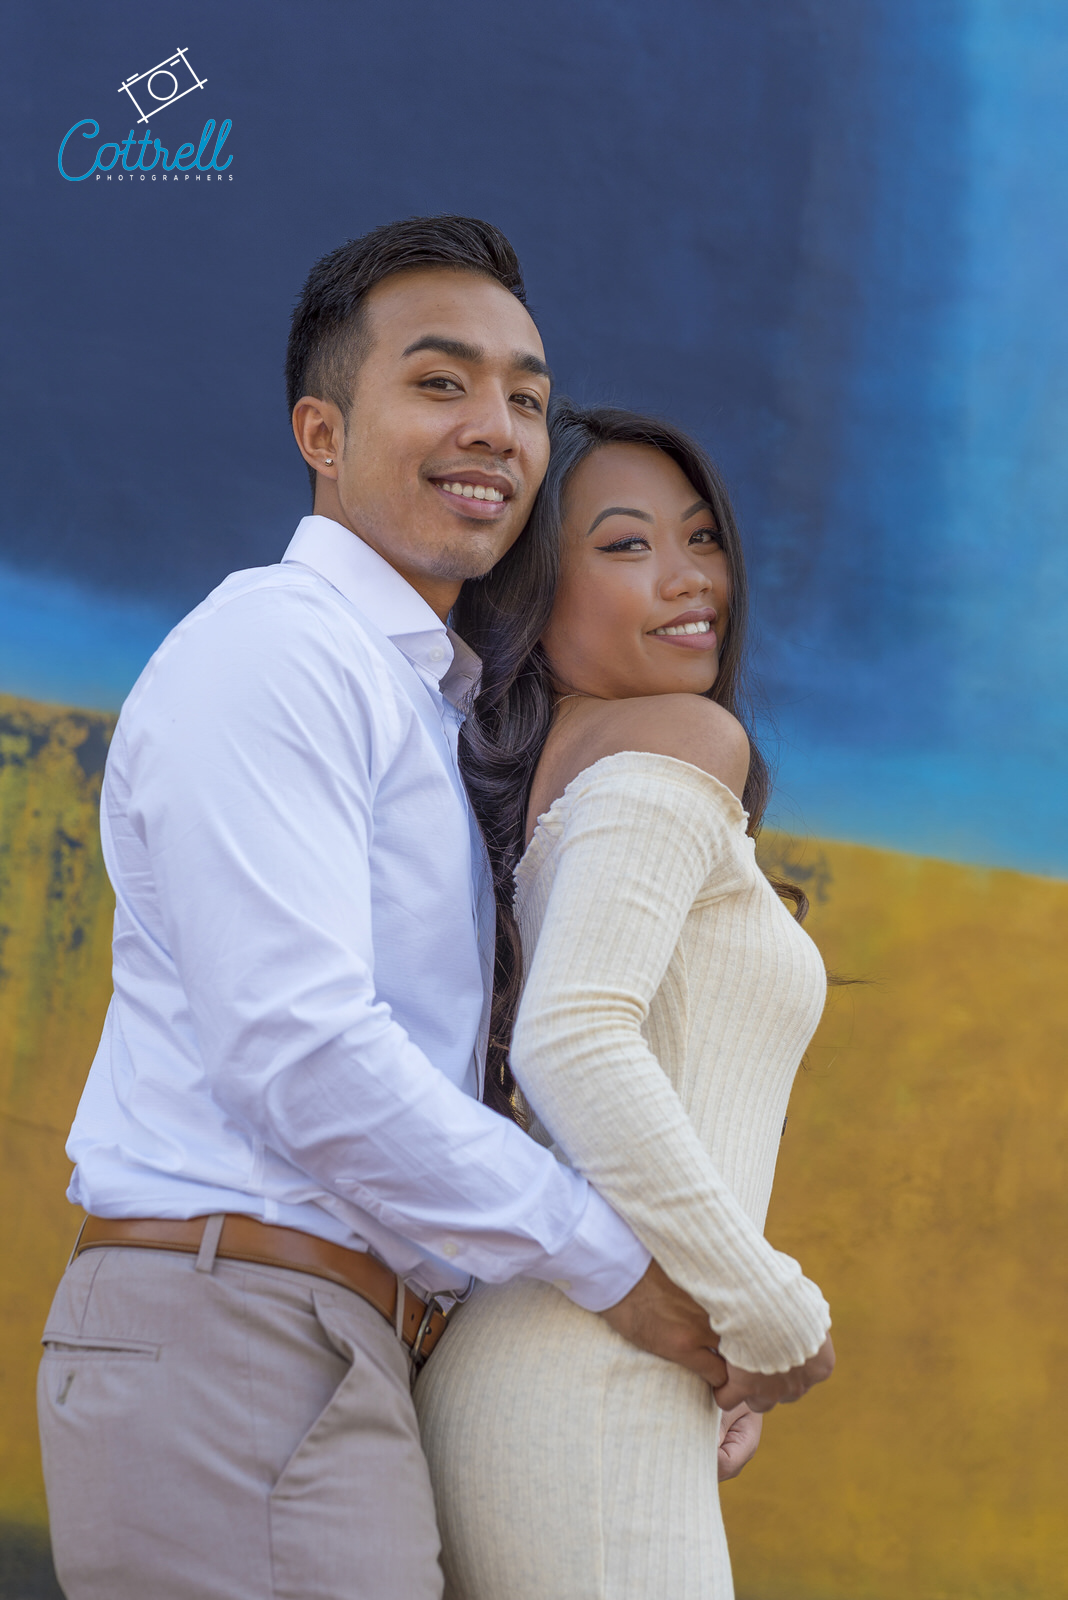 Professional Photographer, families, weddings, portraits, people